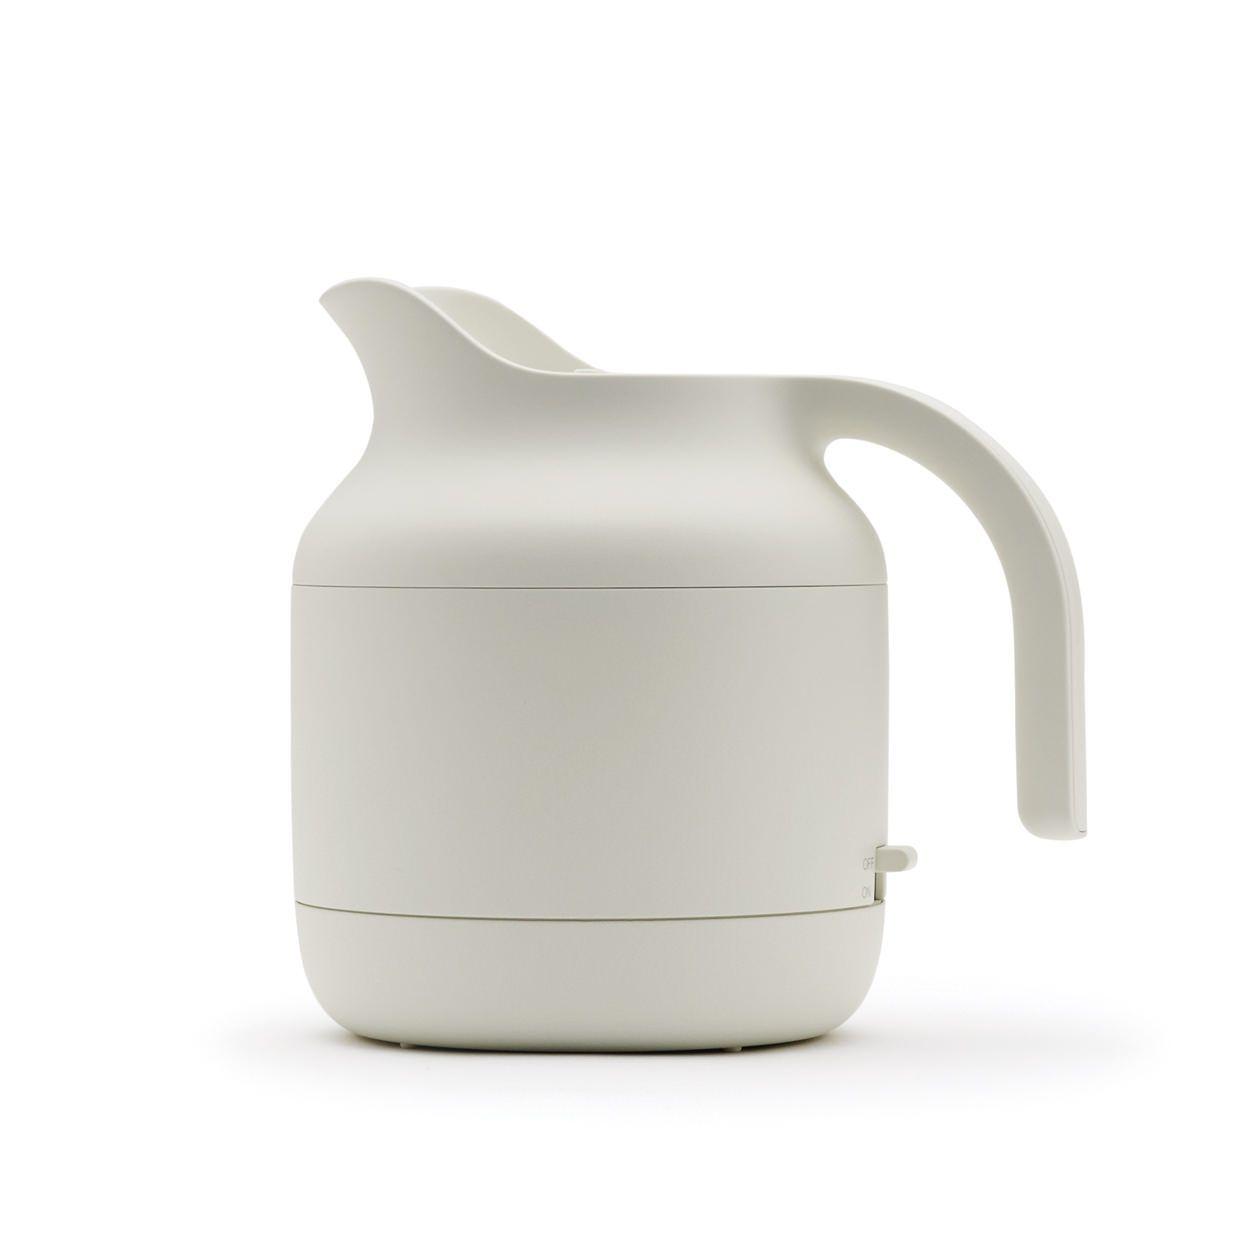 Electric kettle, Kettle, Naoto fukasawa